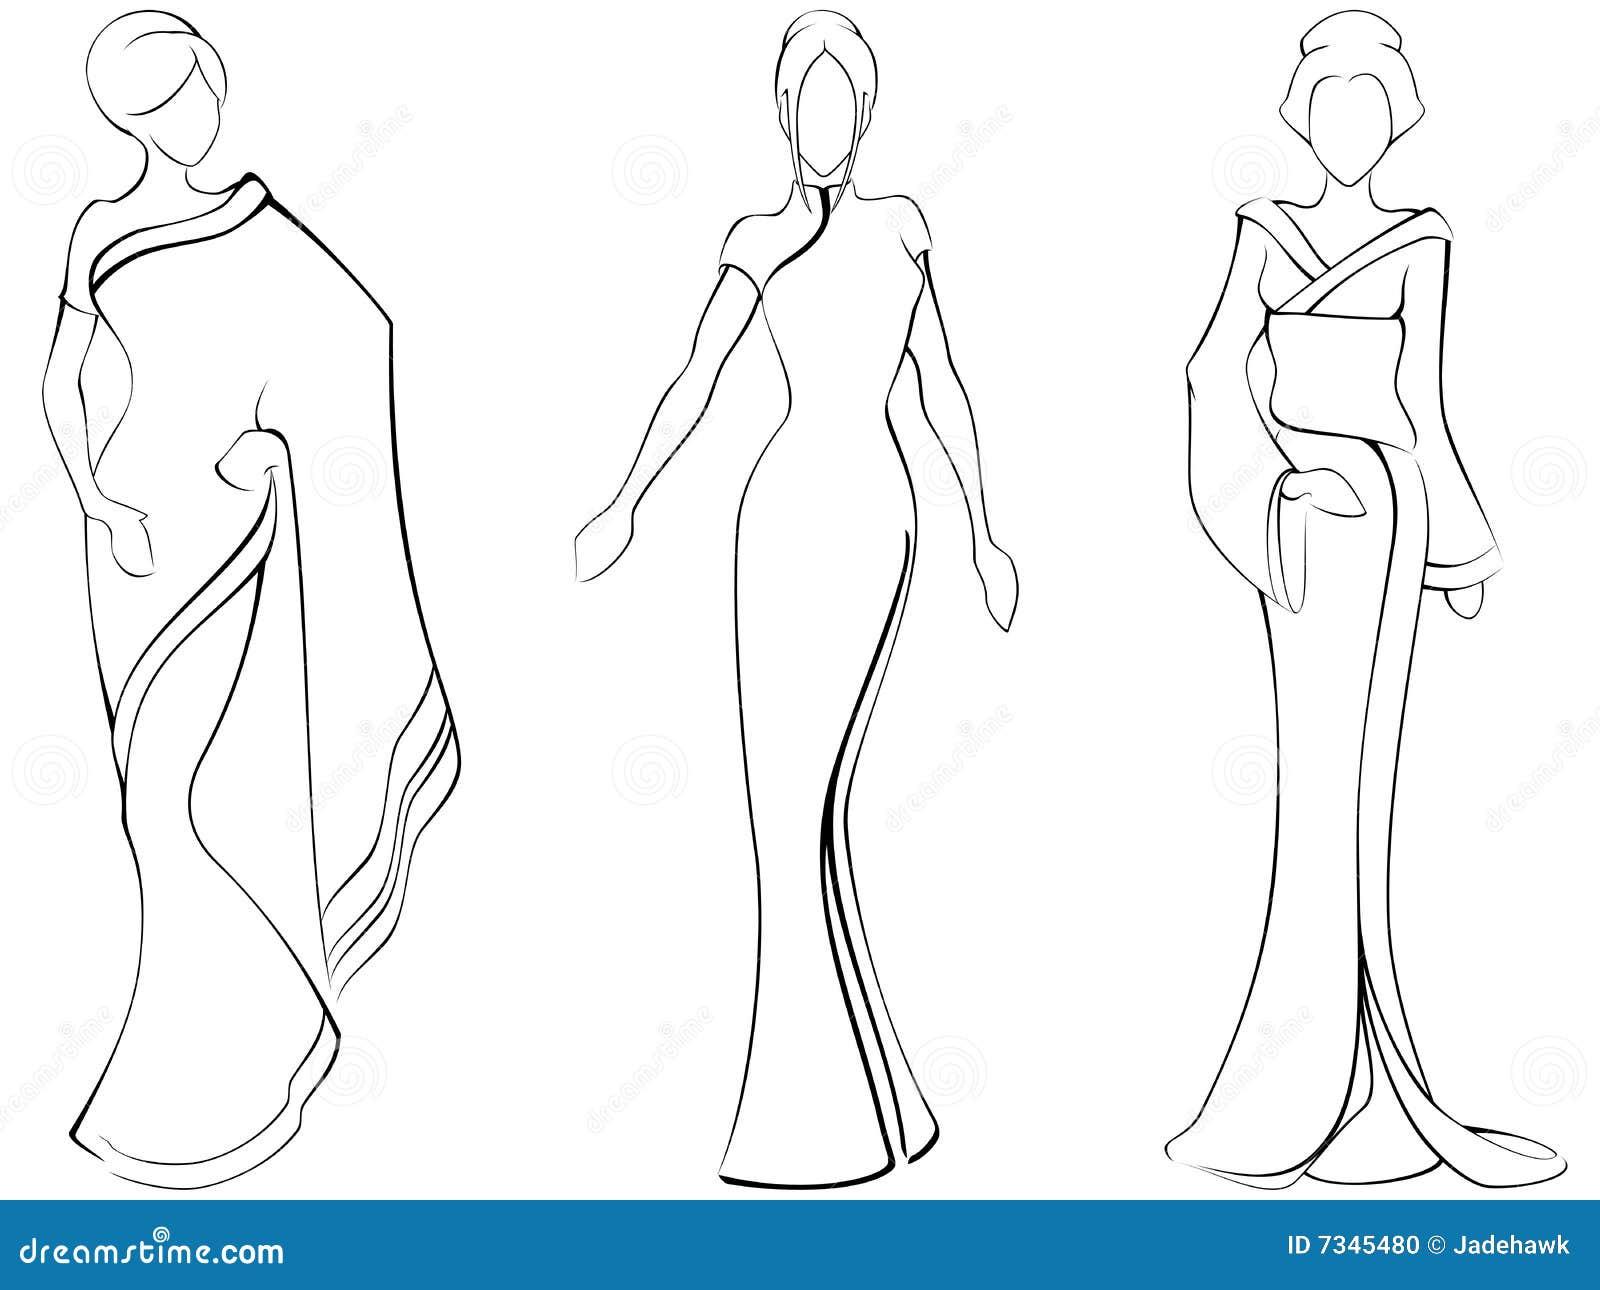 AA001303 likewise Desenho de moda additionally Stockfoto Skizze Der Asiatischen Frauen Image7345480 furthermore Colonial5 besides Manga Female Body Clothing Sketch Templates. on skirt easy fashion sketches